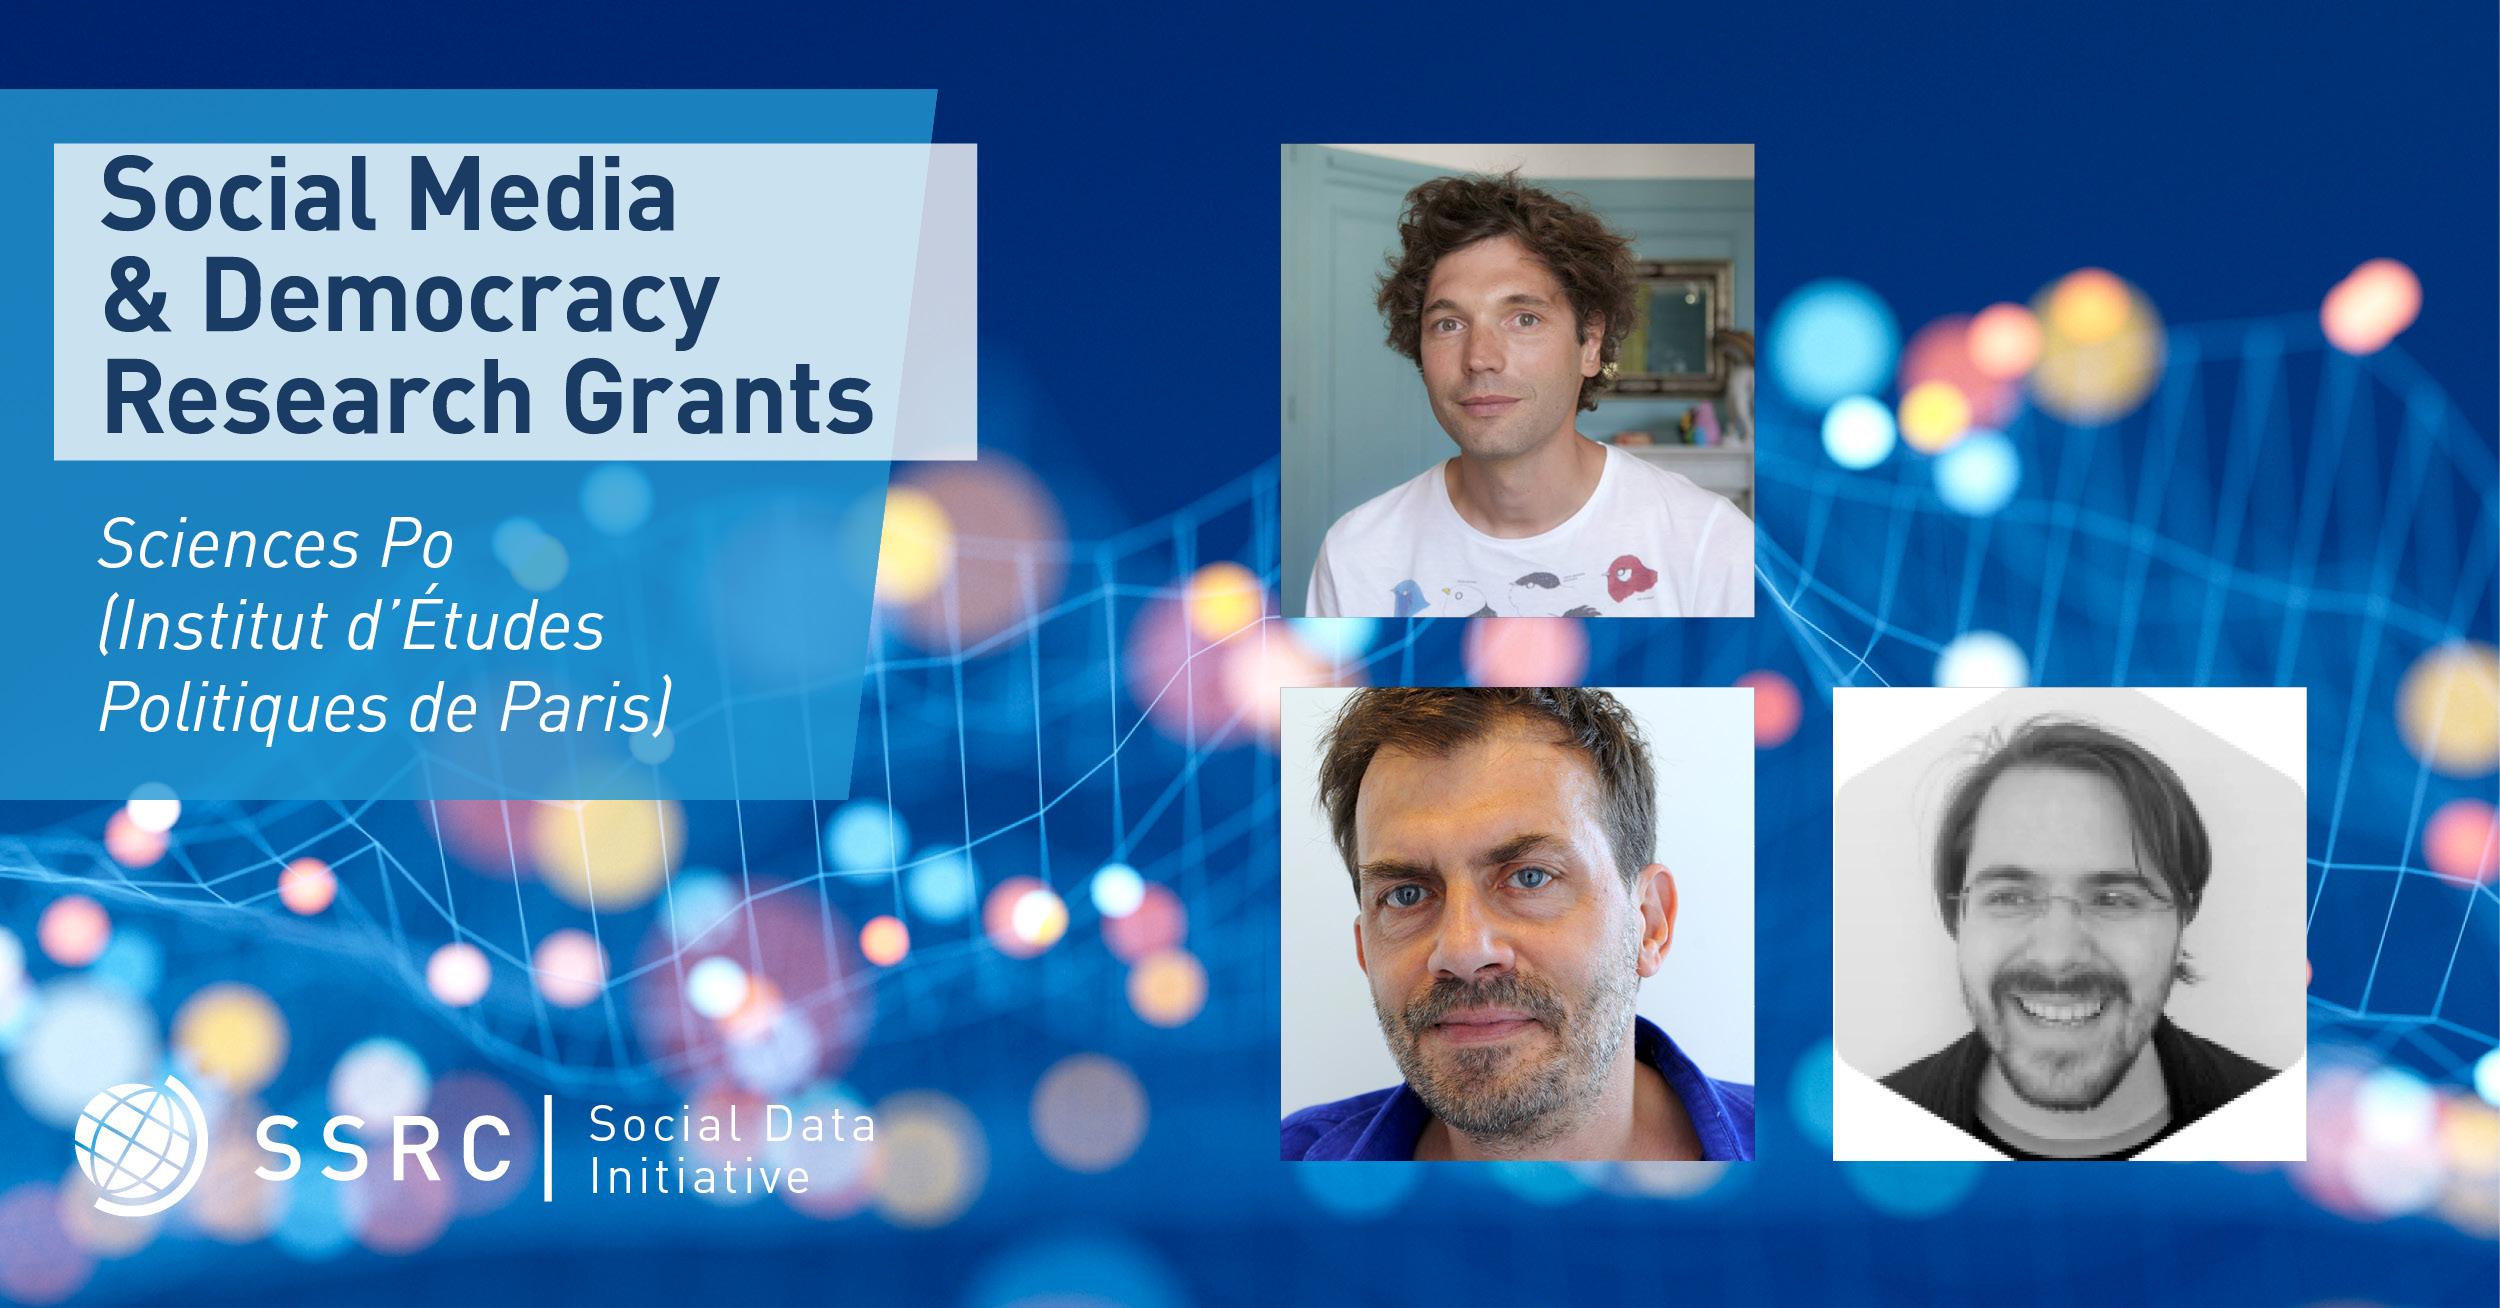 Dissertation research grants social sciences